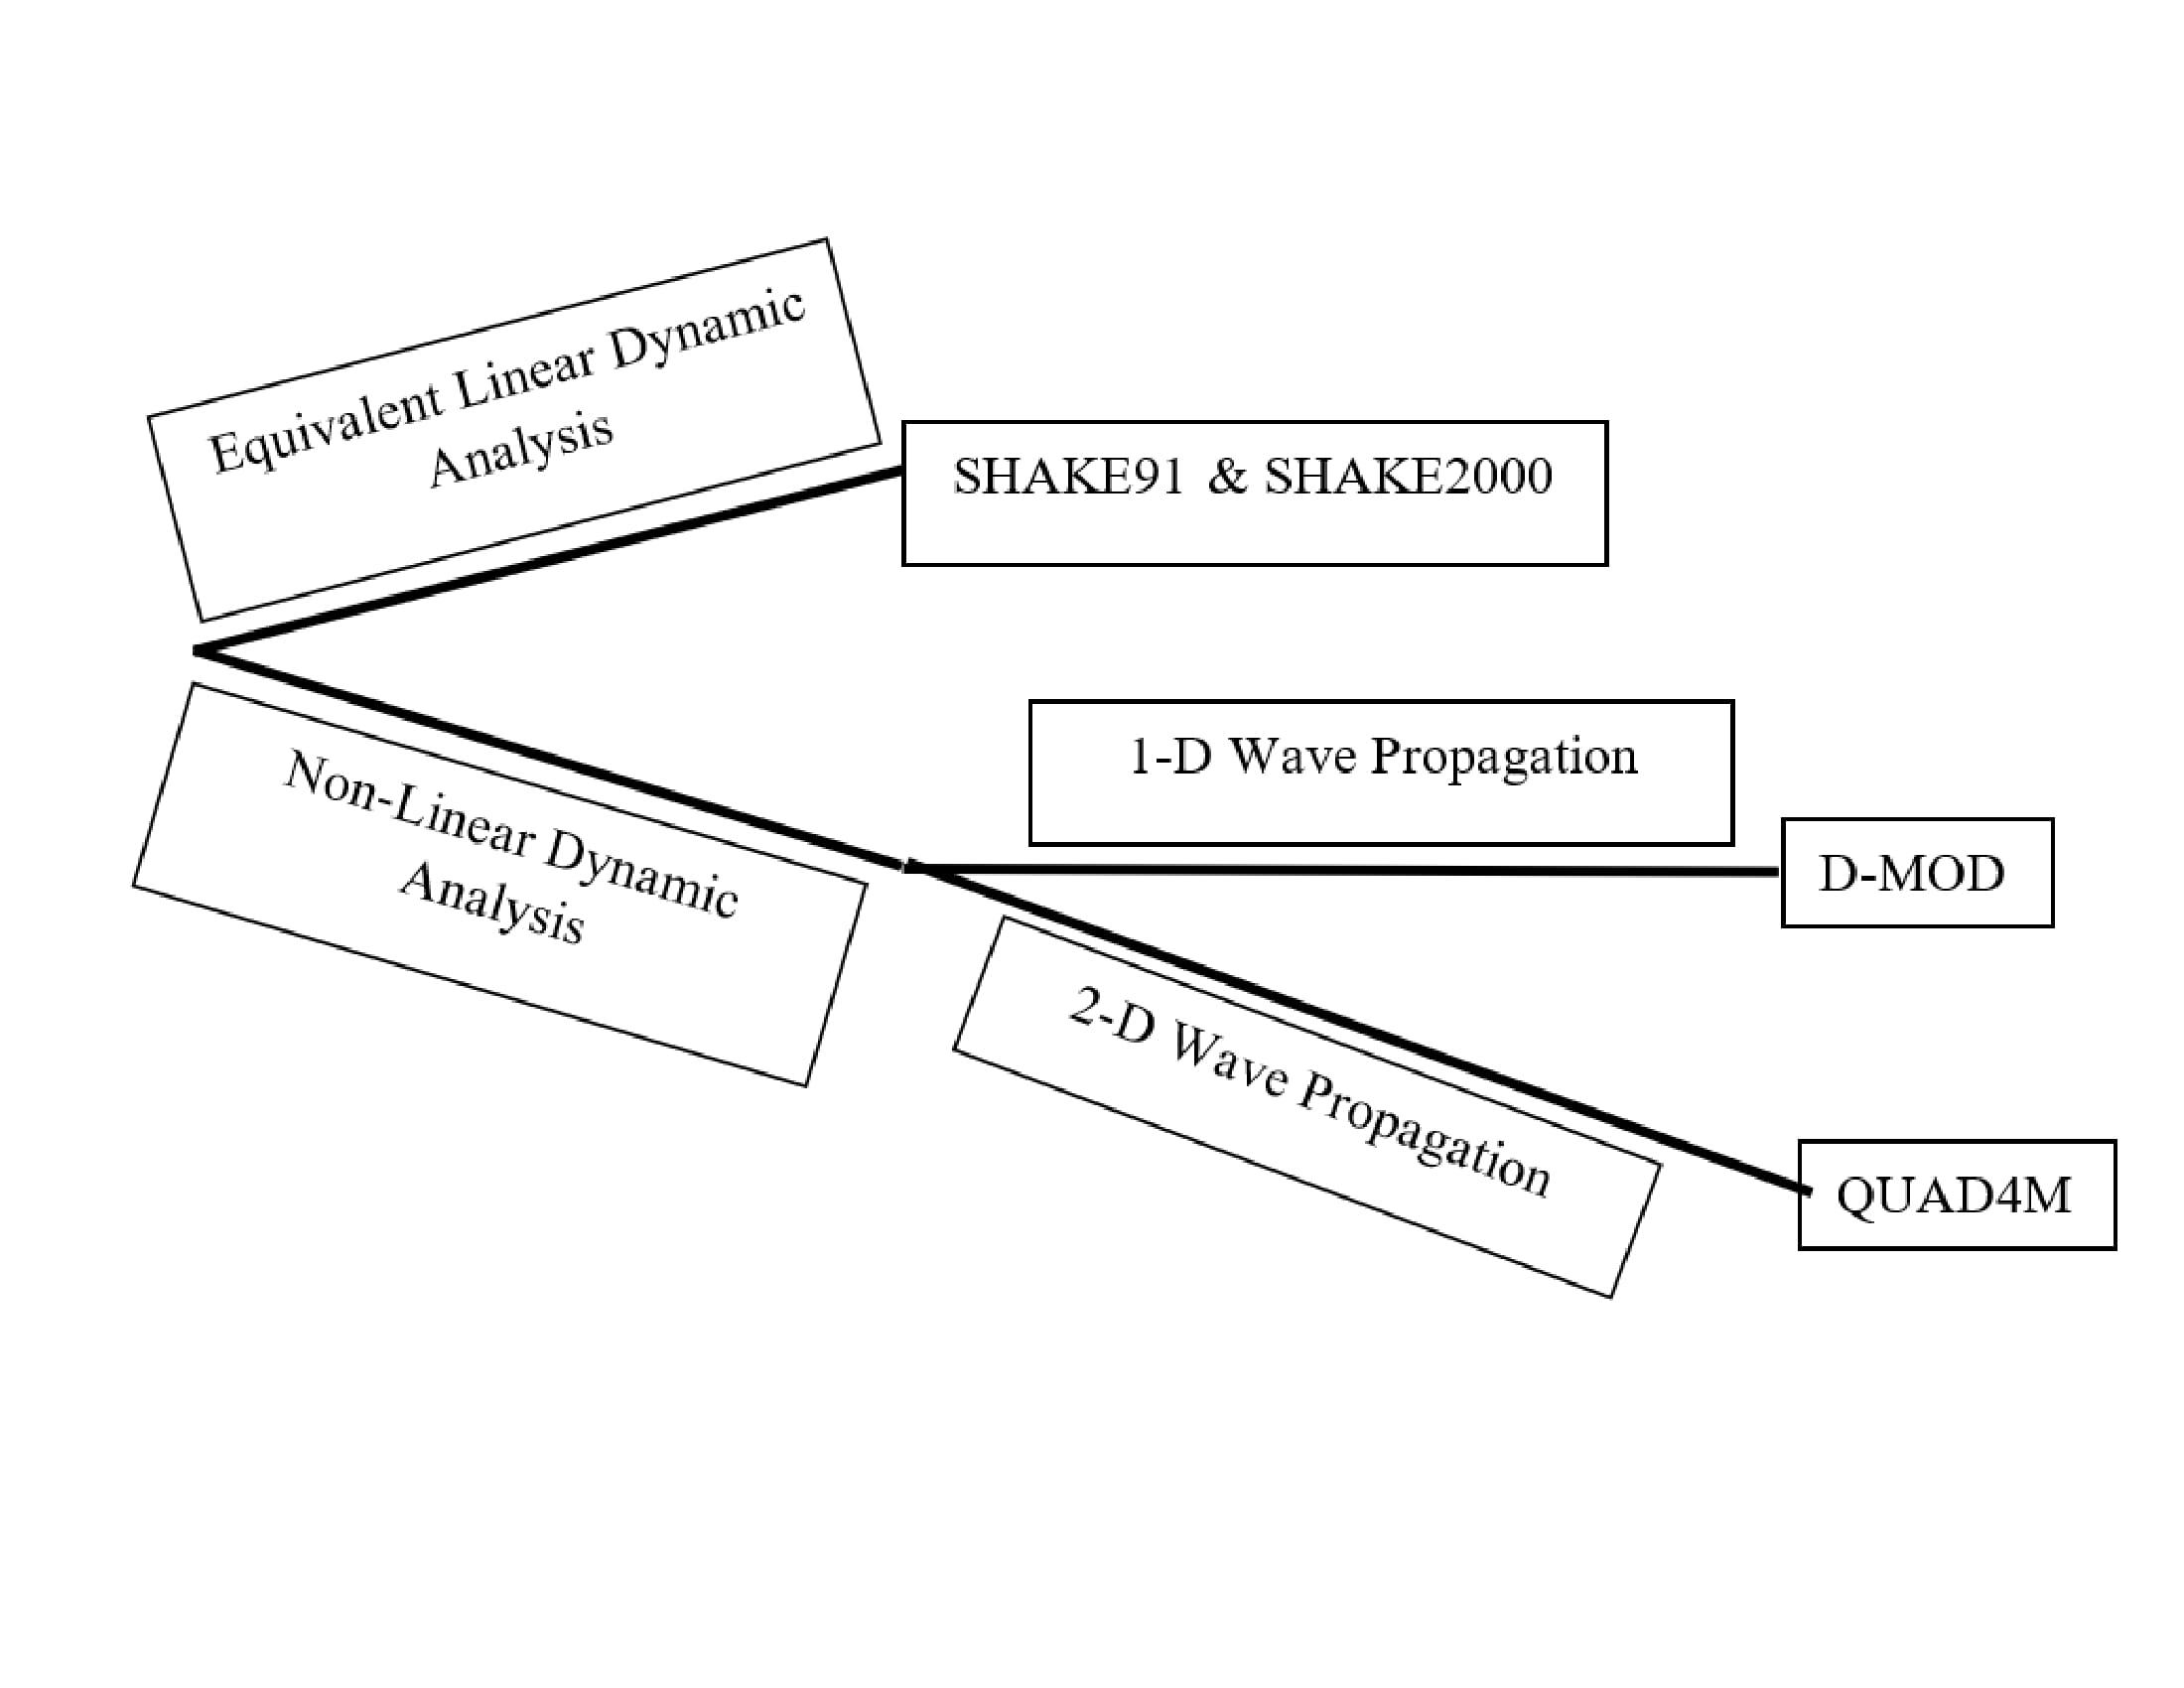 computer program diagram-1